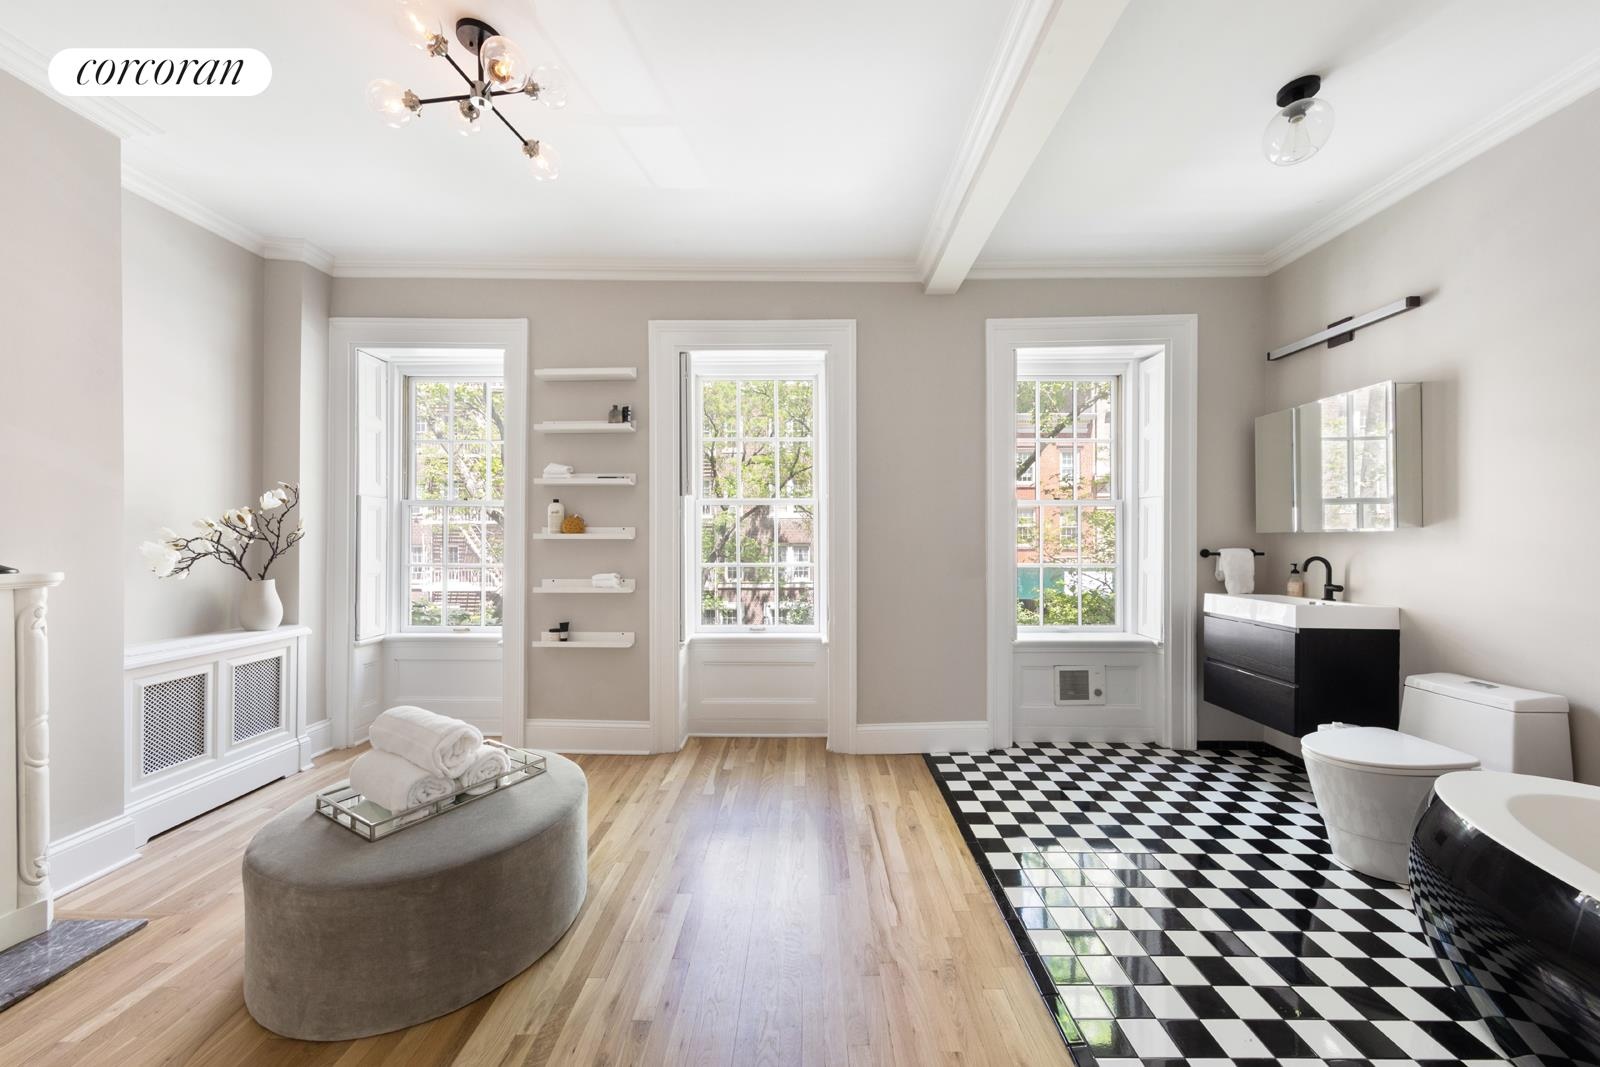 112 West 13th Street Greenwich Village New York NY 10011